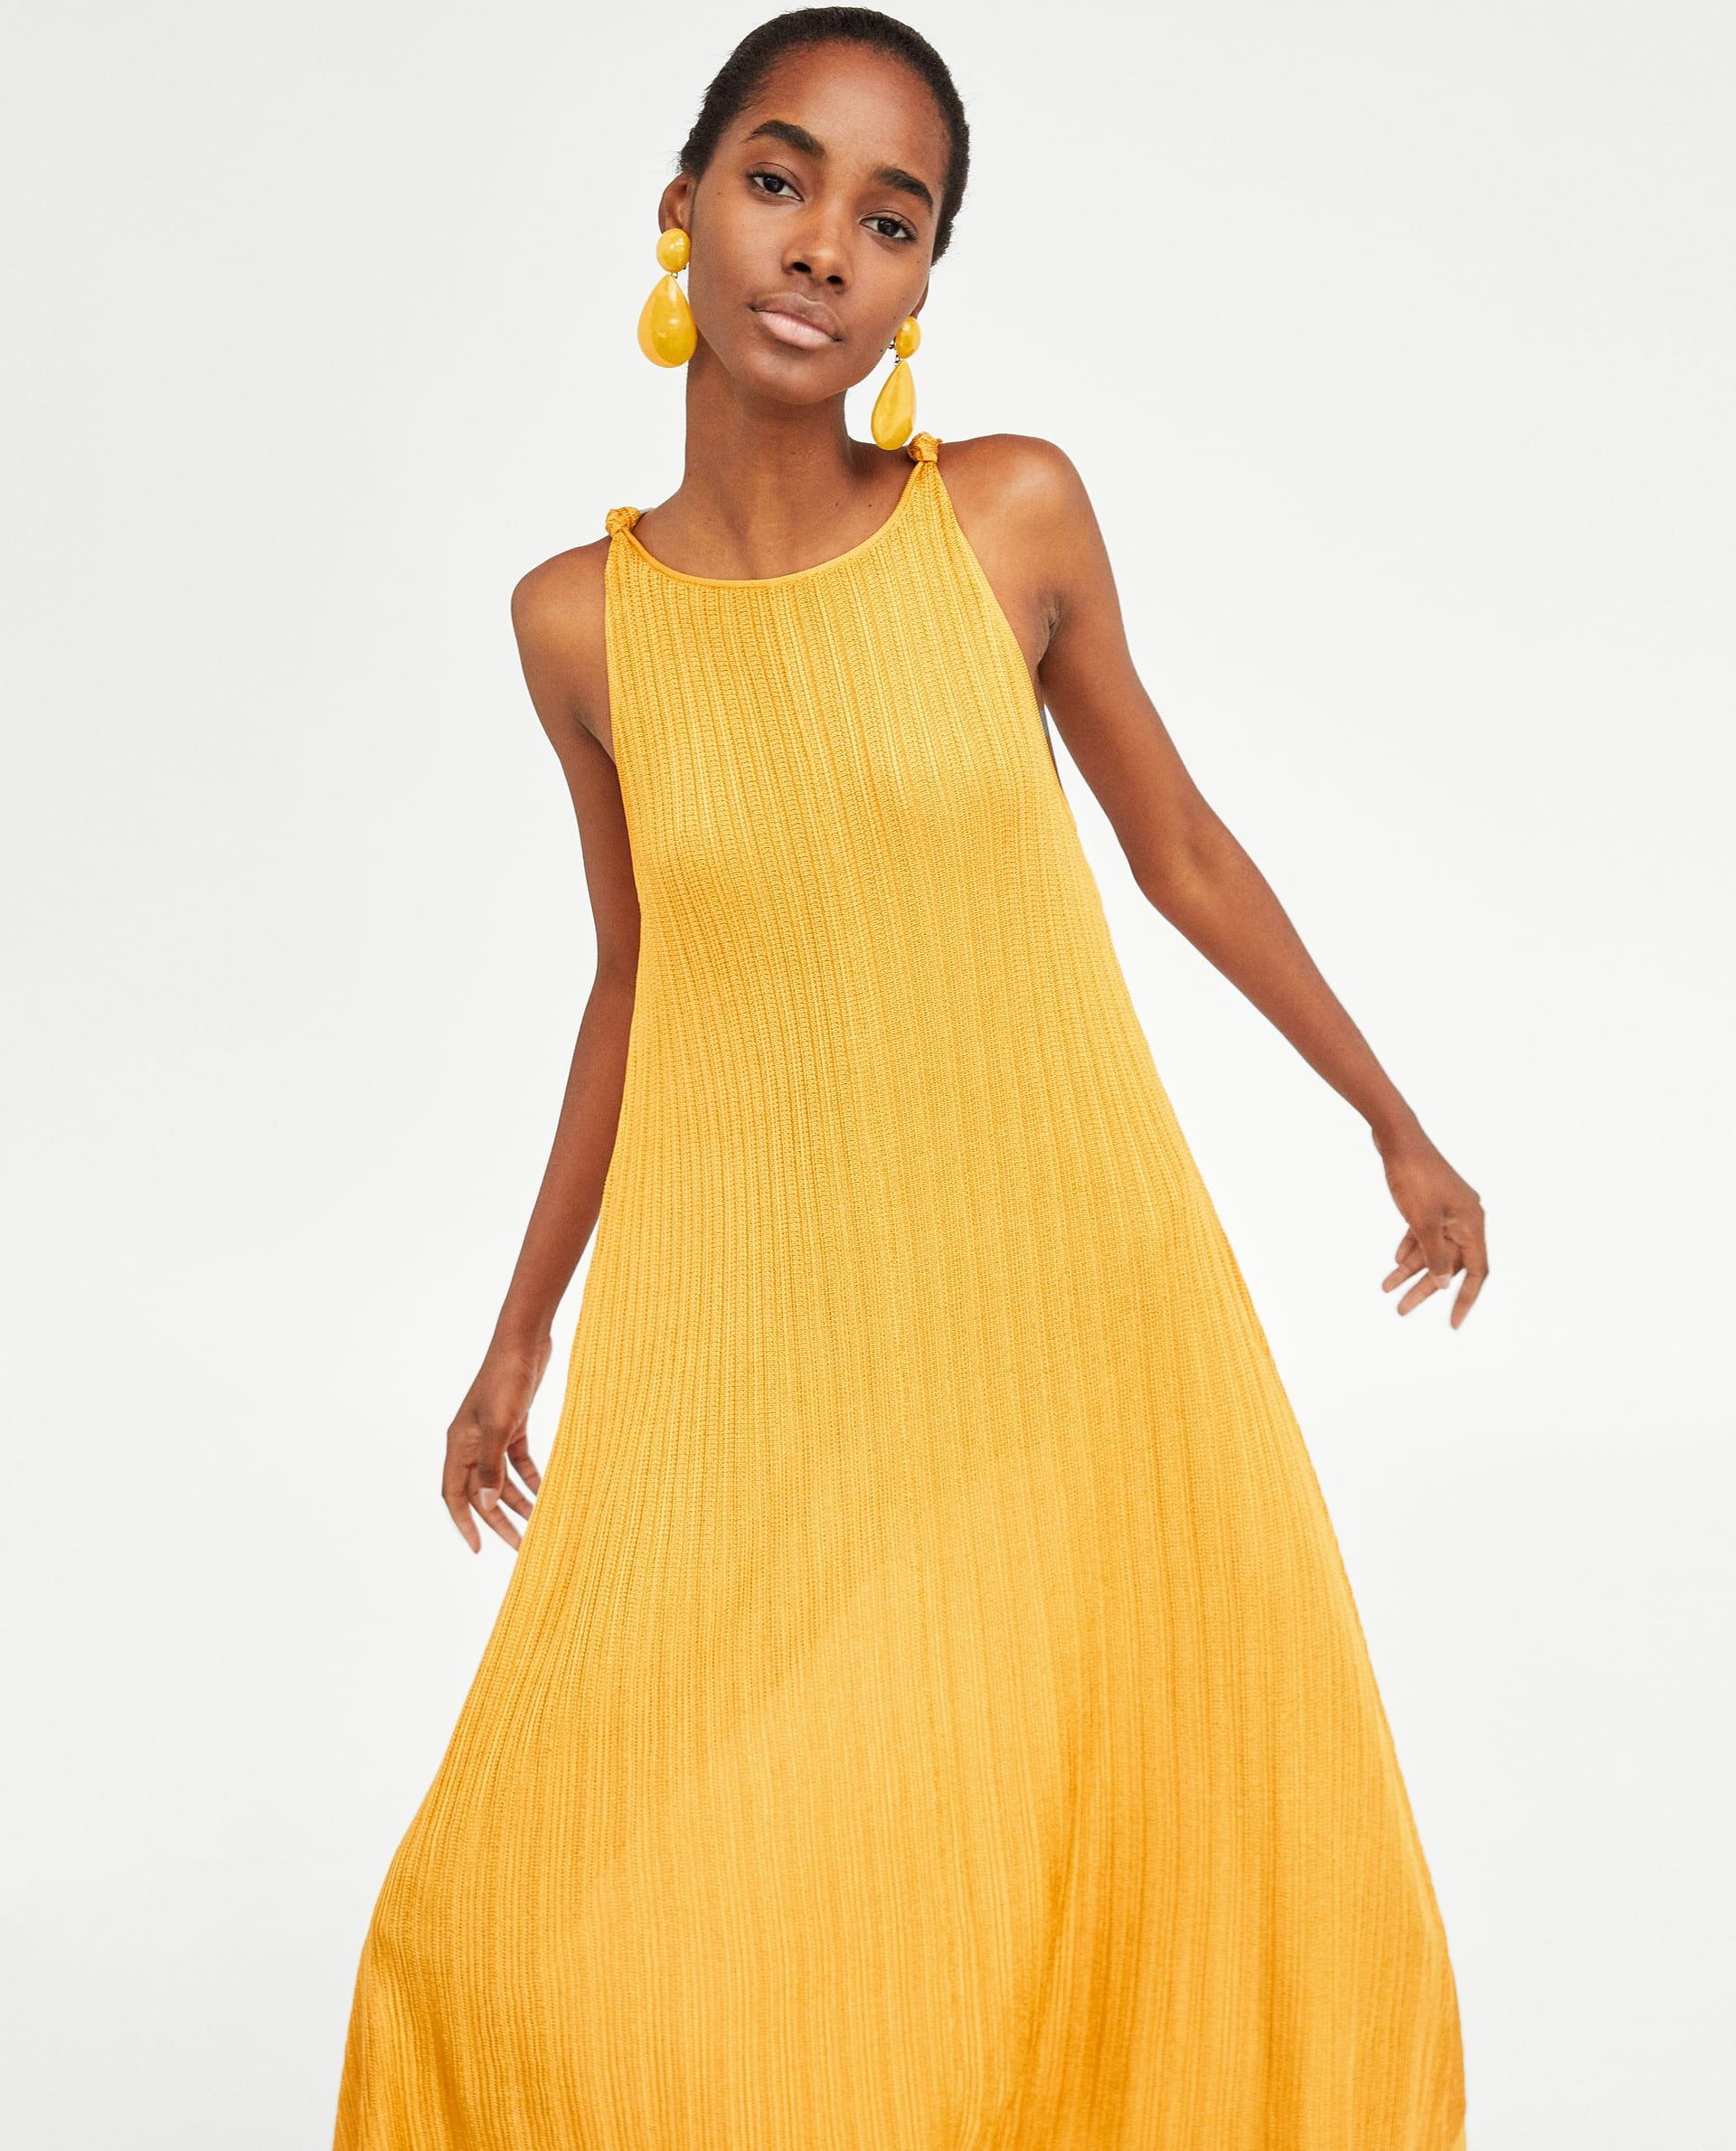 Women S Dresses New Collection Online Zara United Kingdom Womens Dresses Knitwear Women Fashion